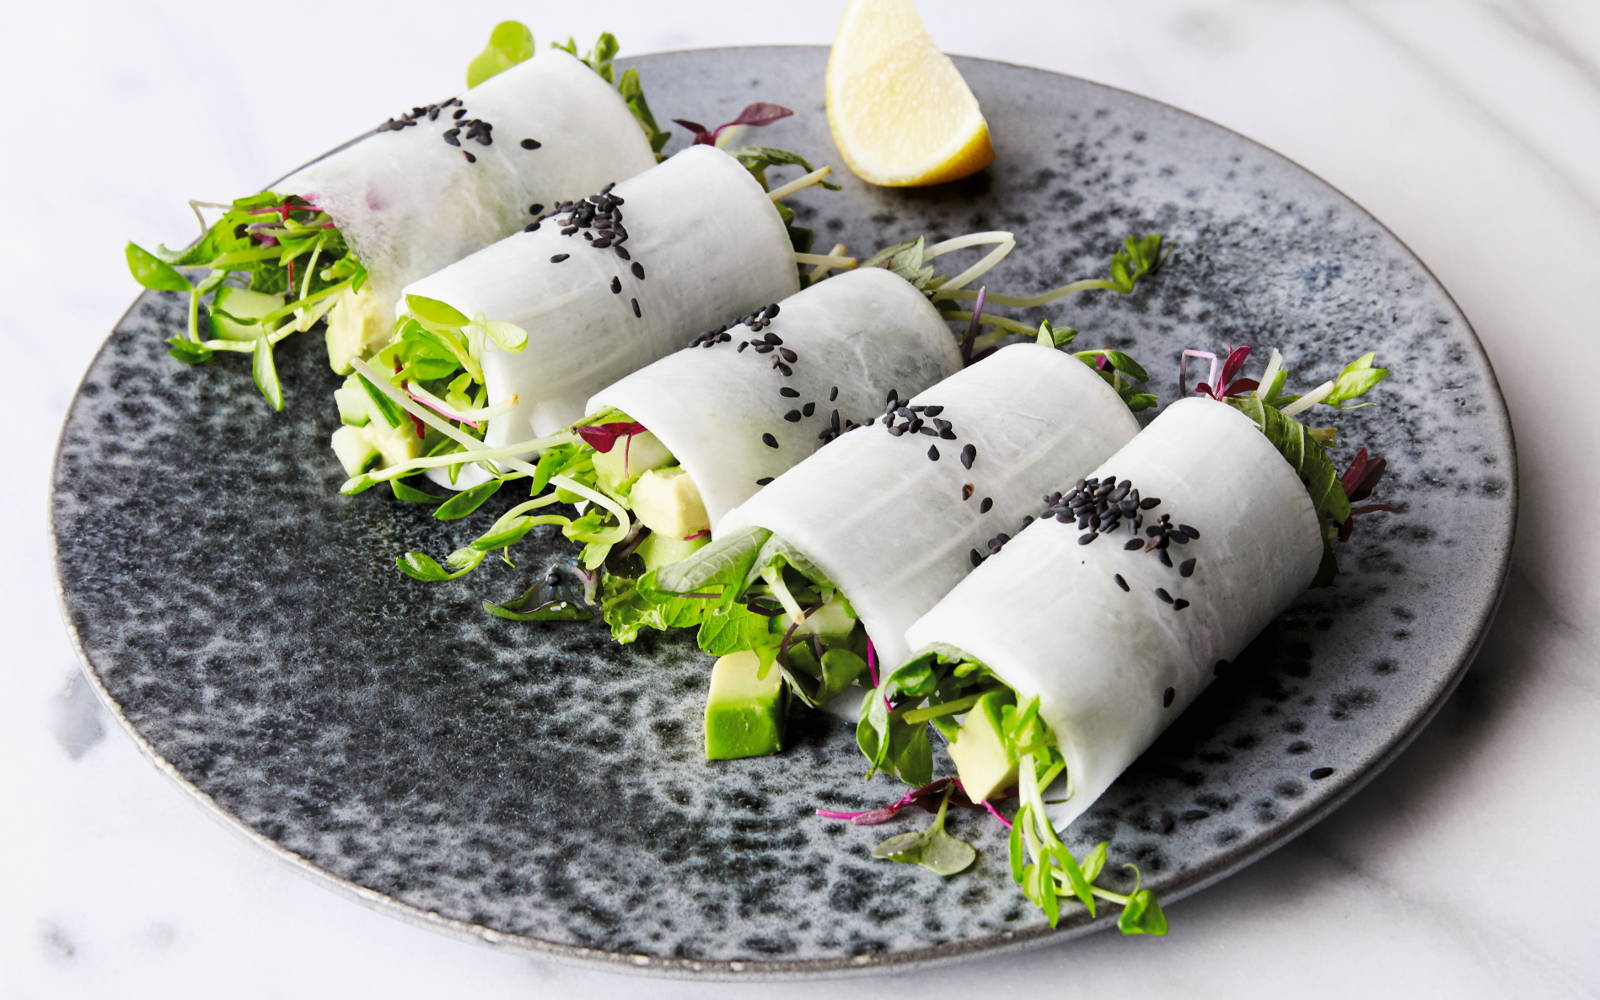 Daikon Rolls with Avocado and Micro Greens